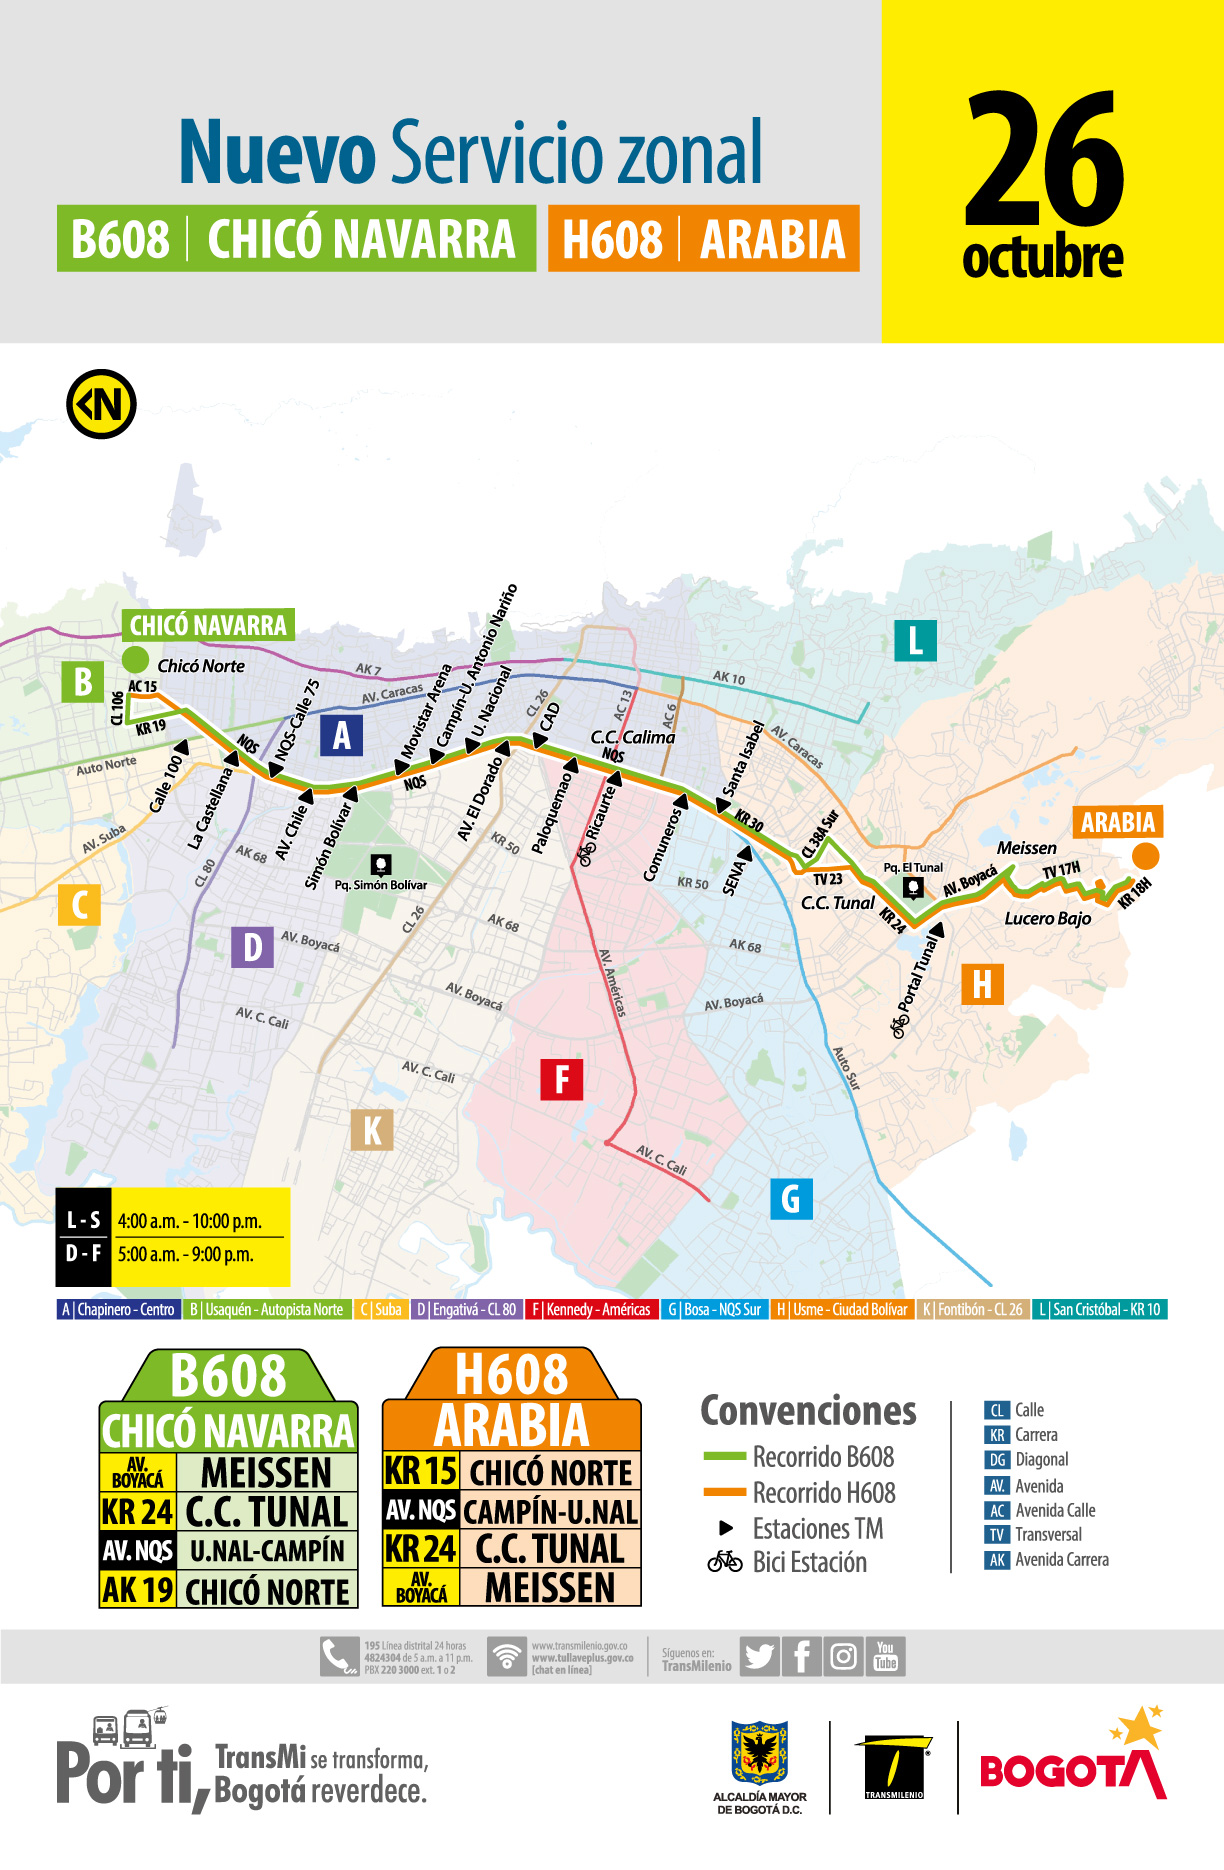 Nueva ruta H608 - B608 Chicó Navarra -Arabia